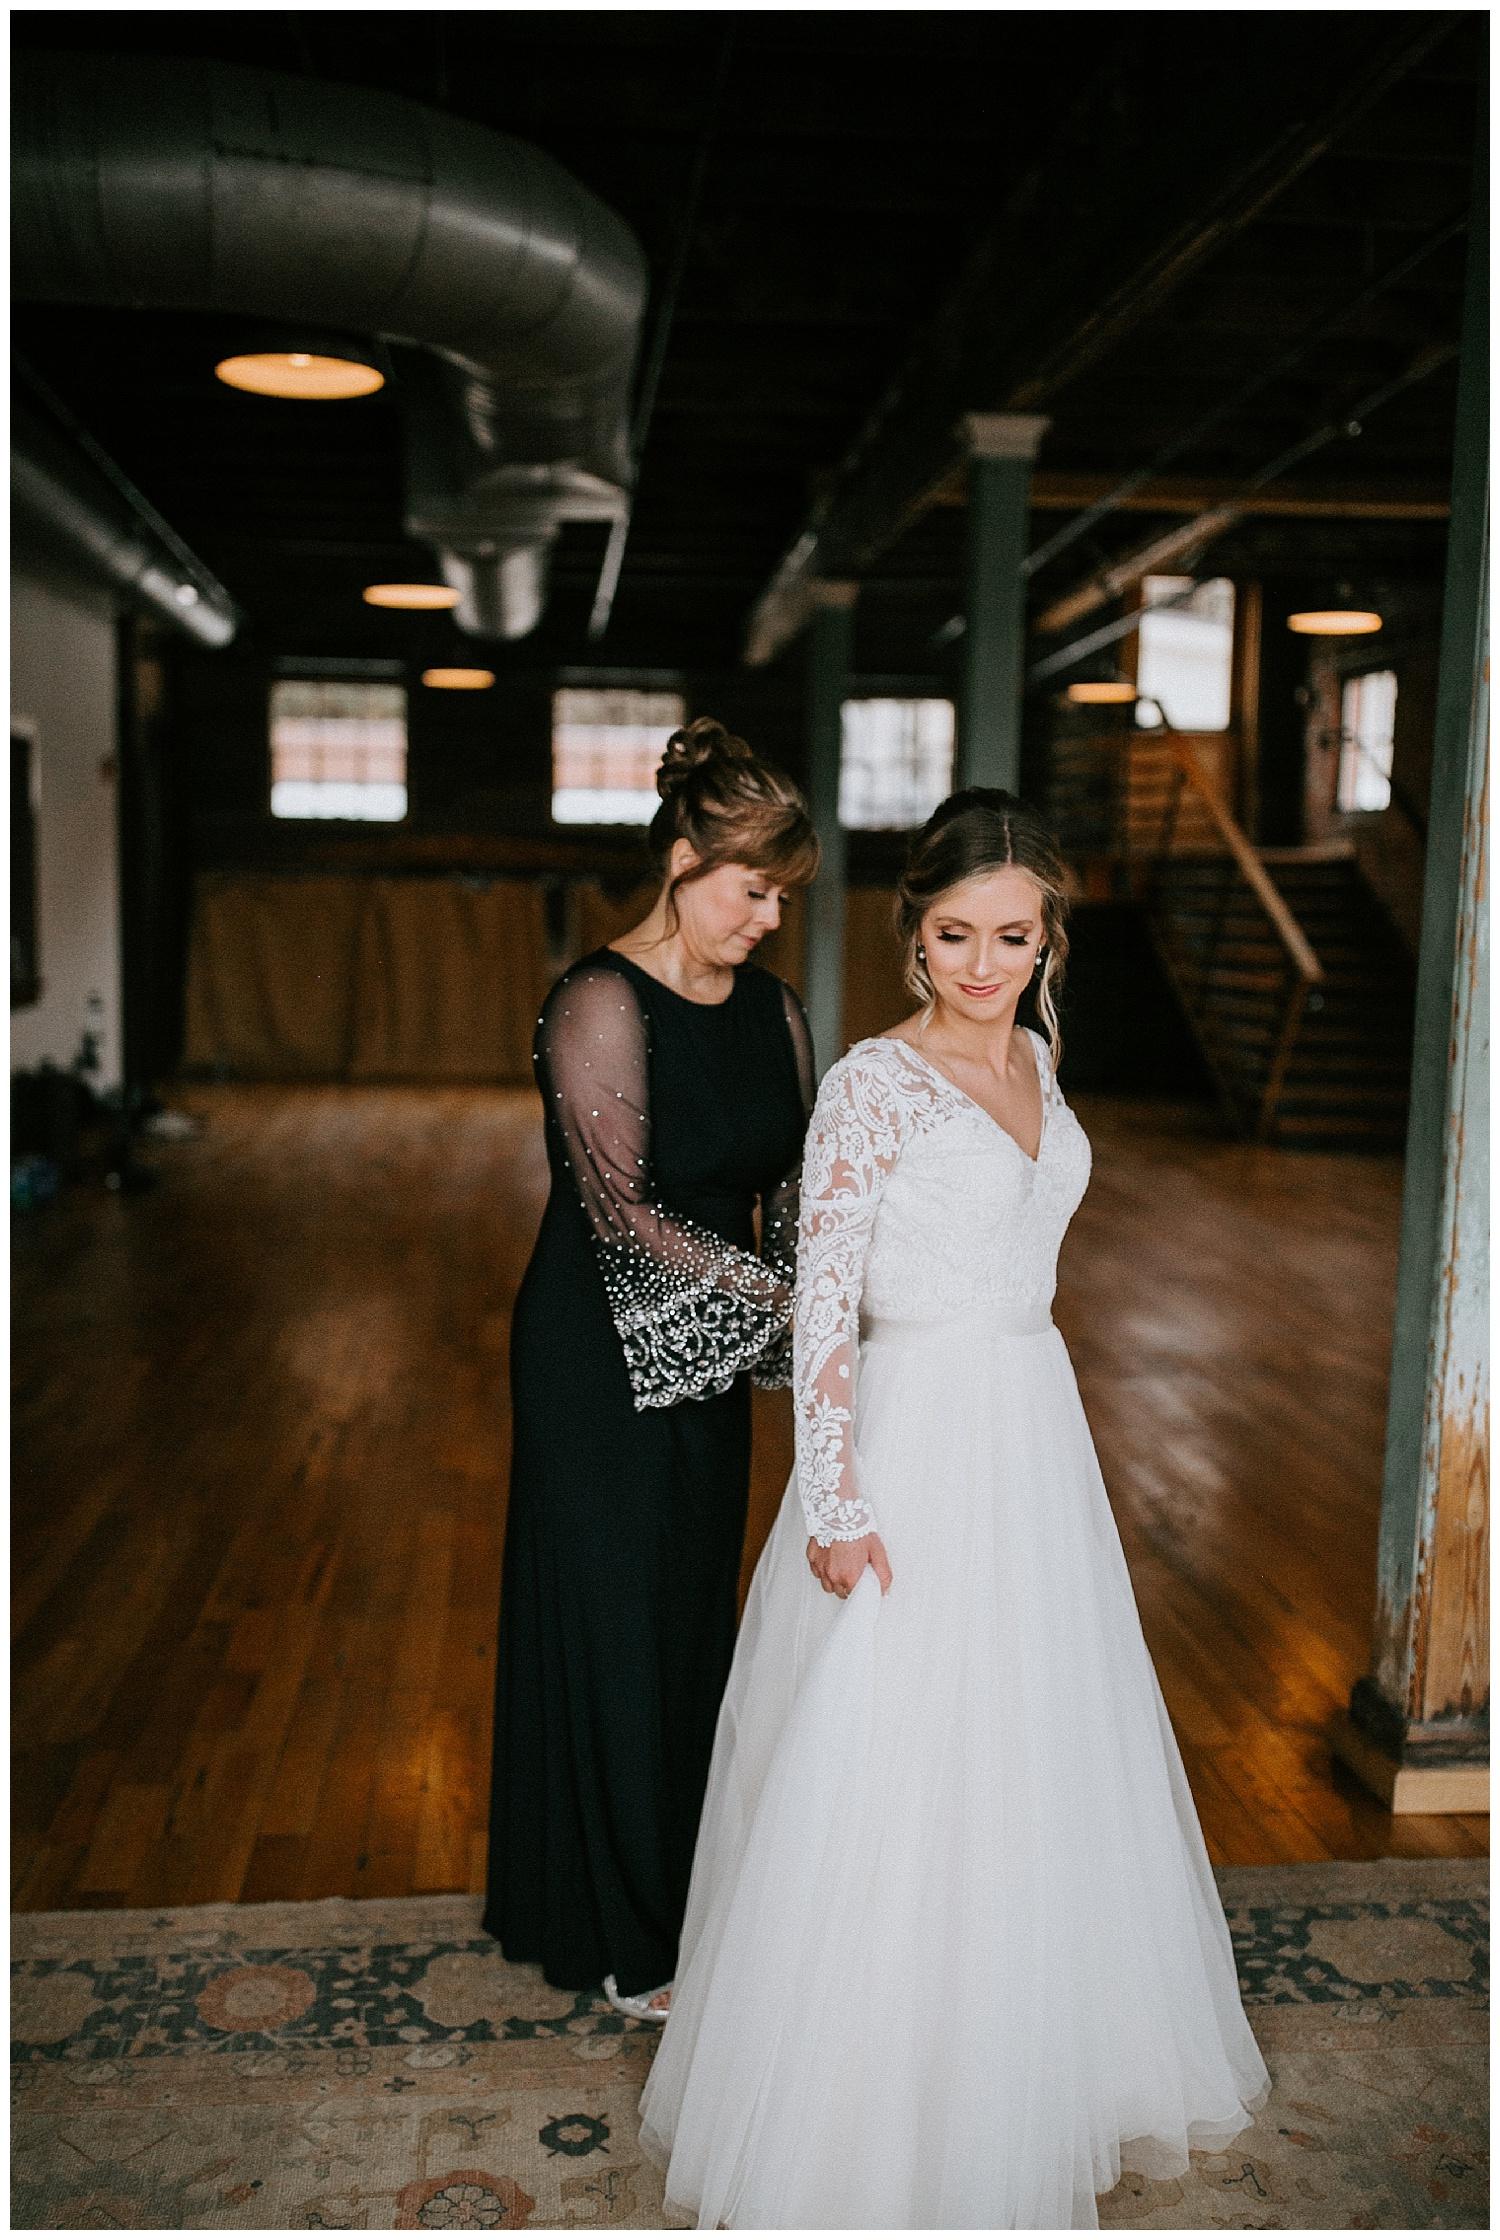 winter-wedding-the standard-knoxville_2019-01-23_0011.jpg